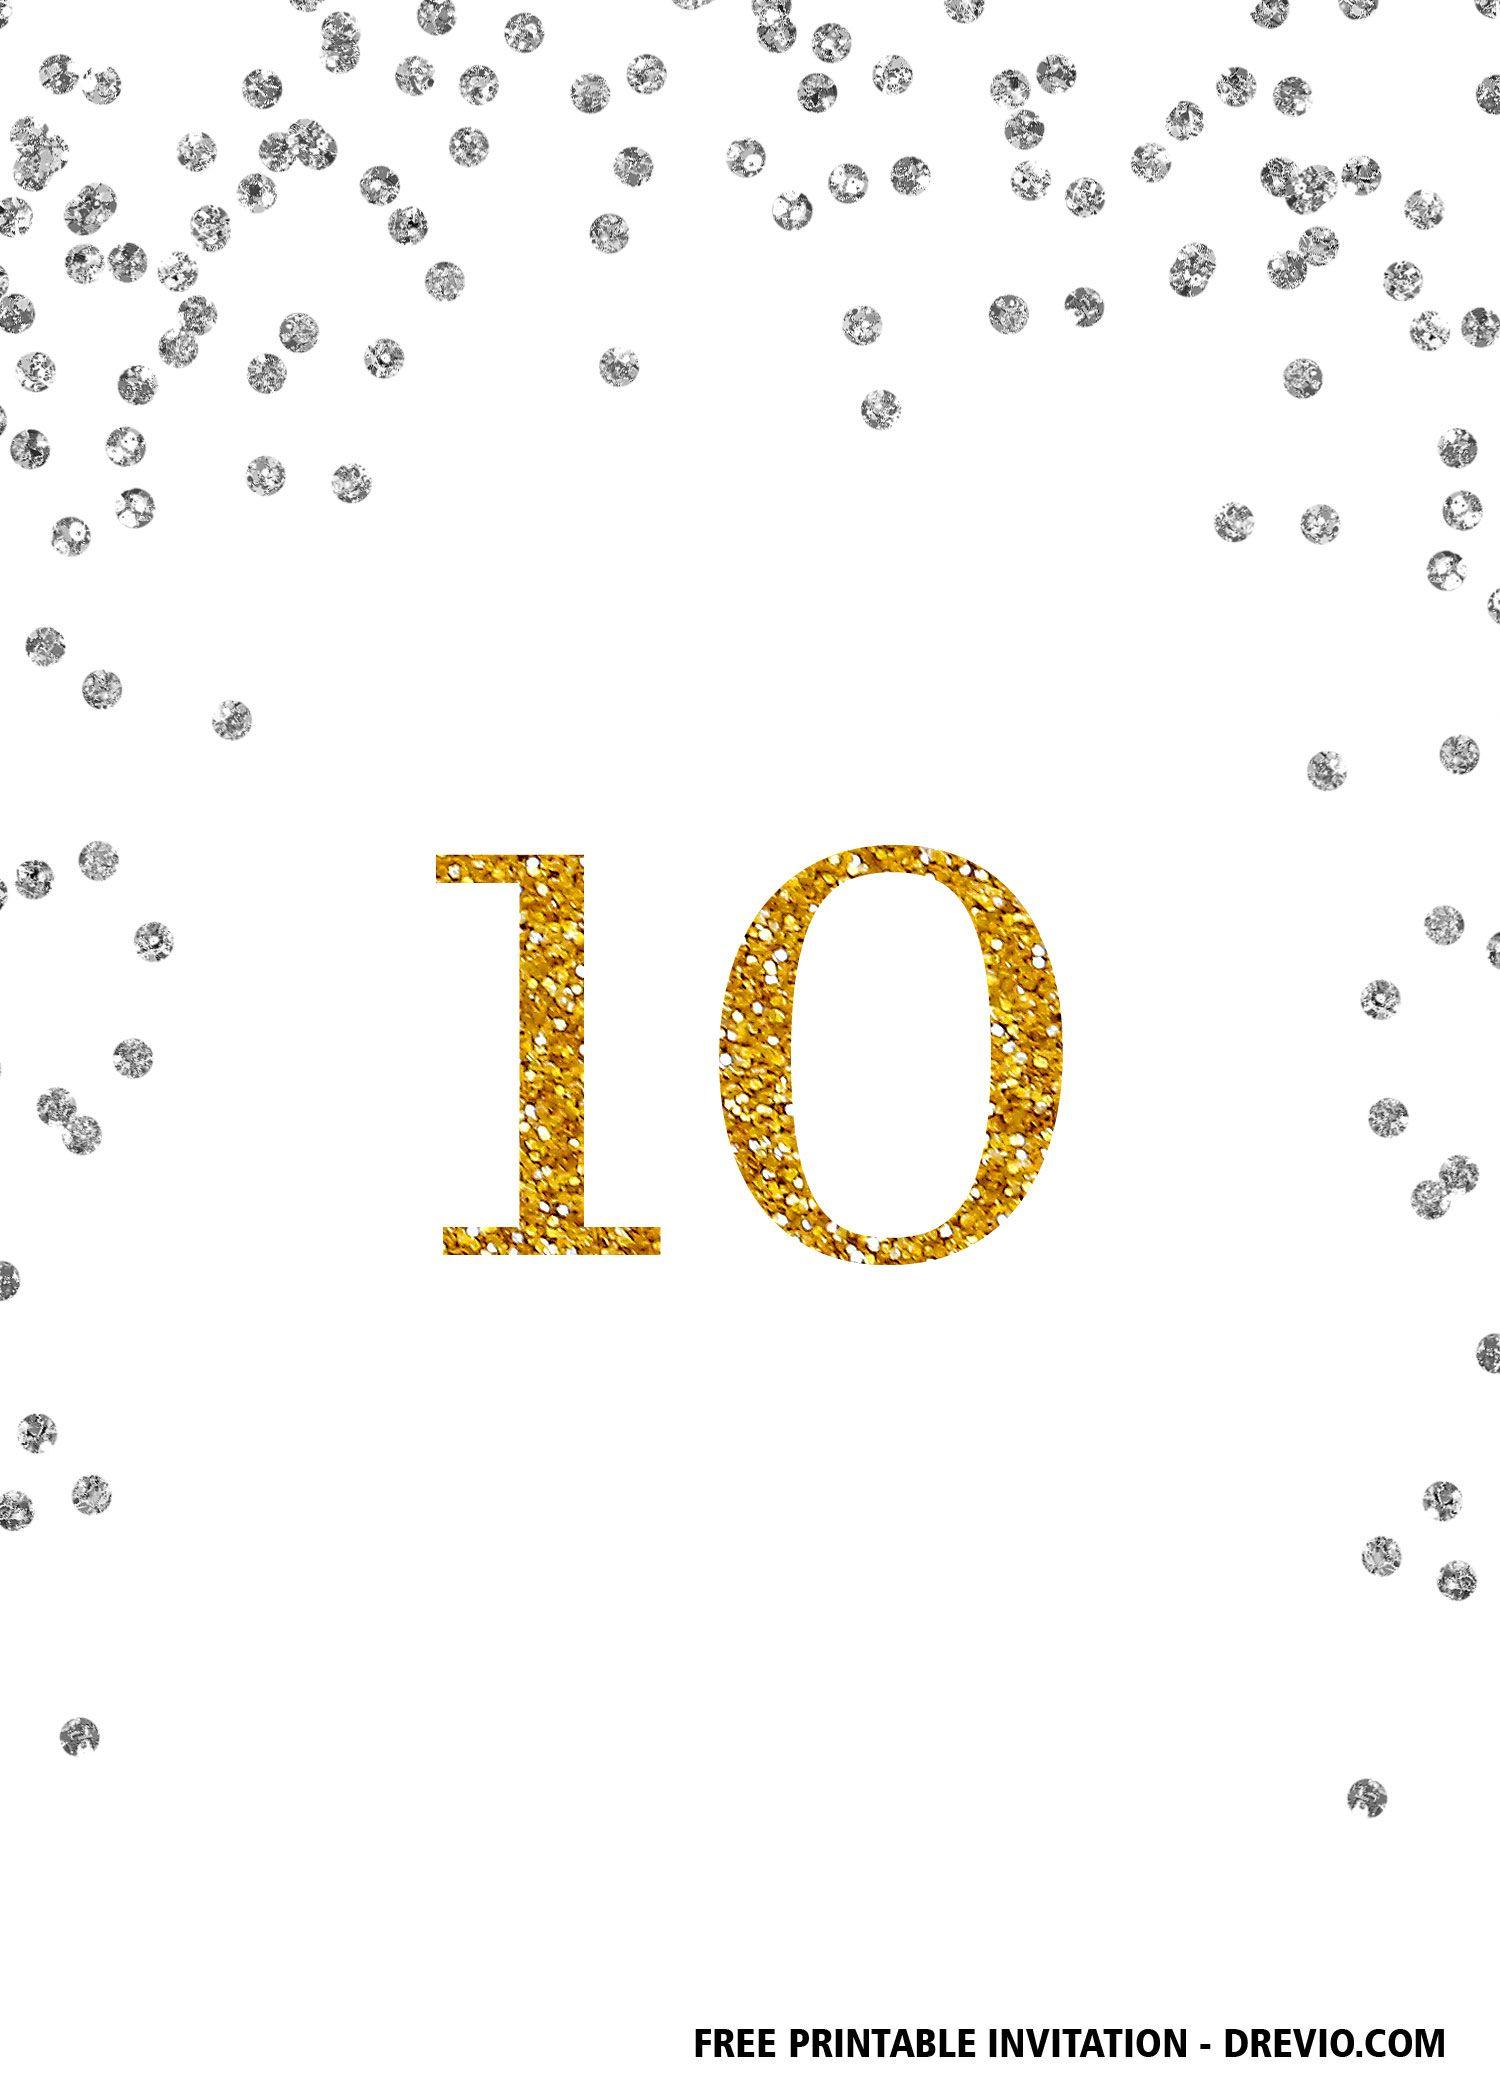 Free Printable 10th Birthday Invitation Templates Birthday Invitation Templates 10th Birthday Invitation Birthday Invitations